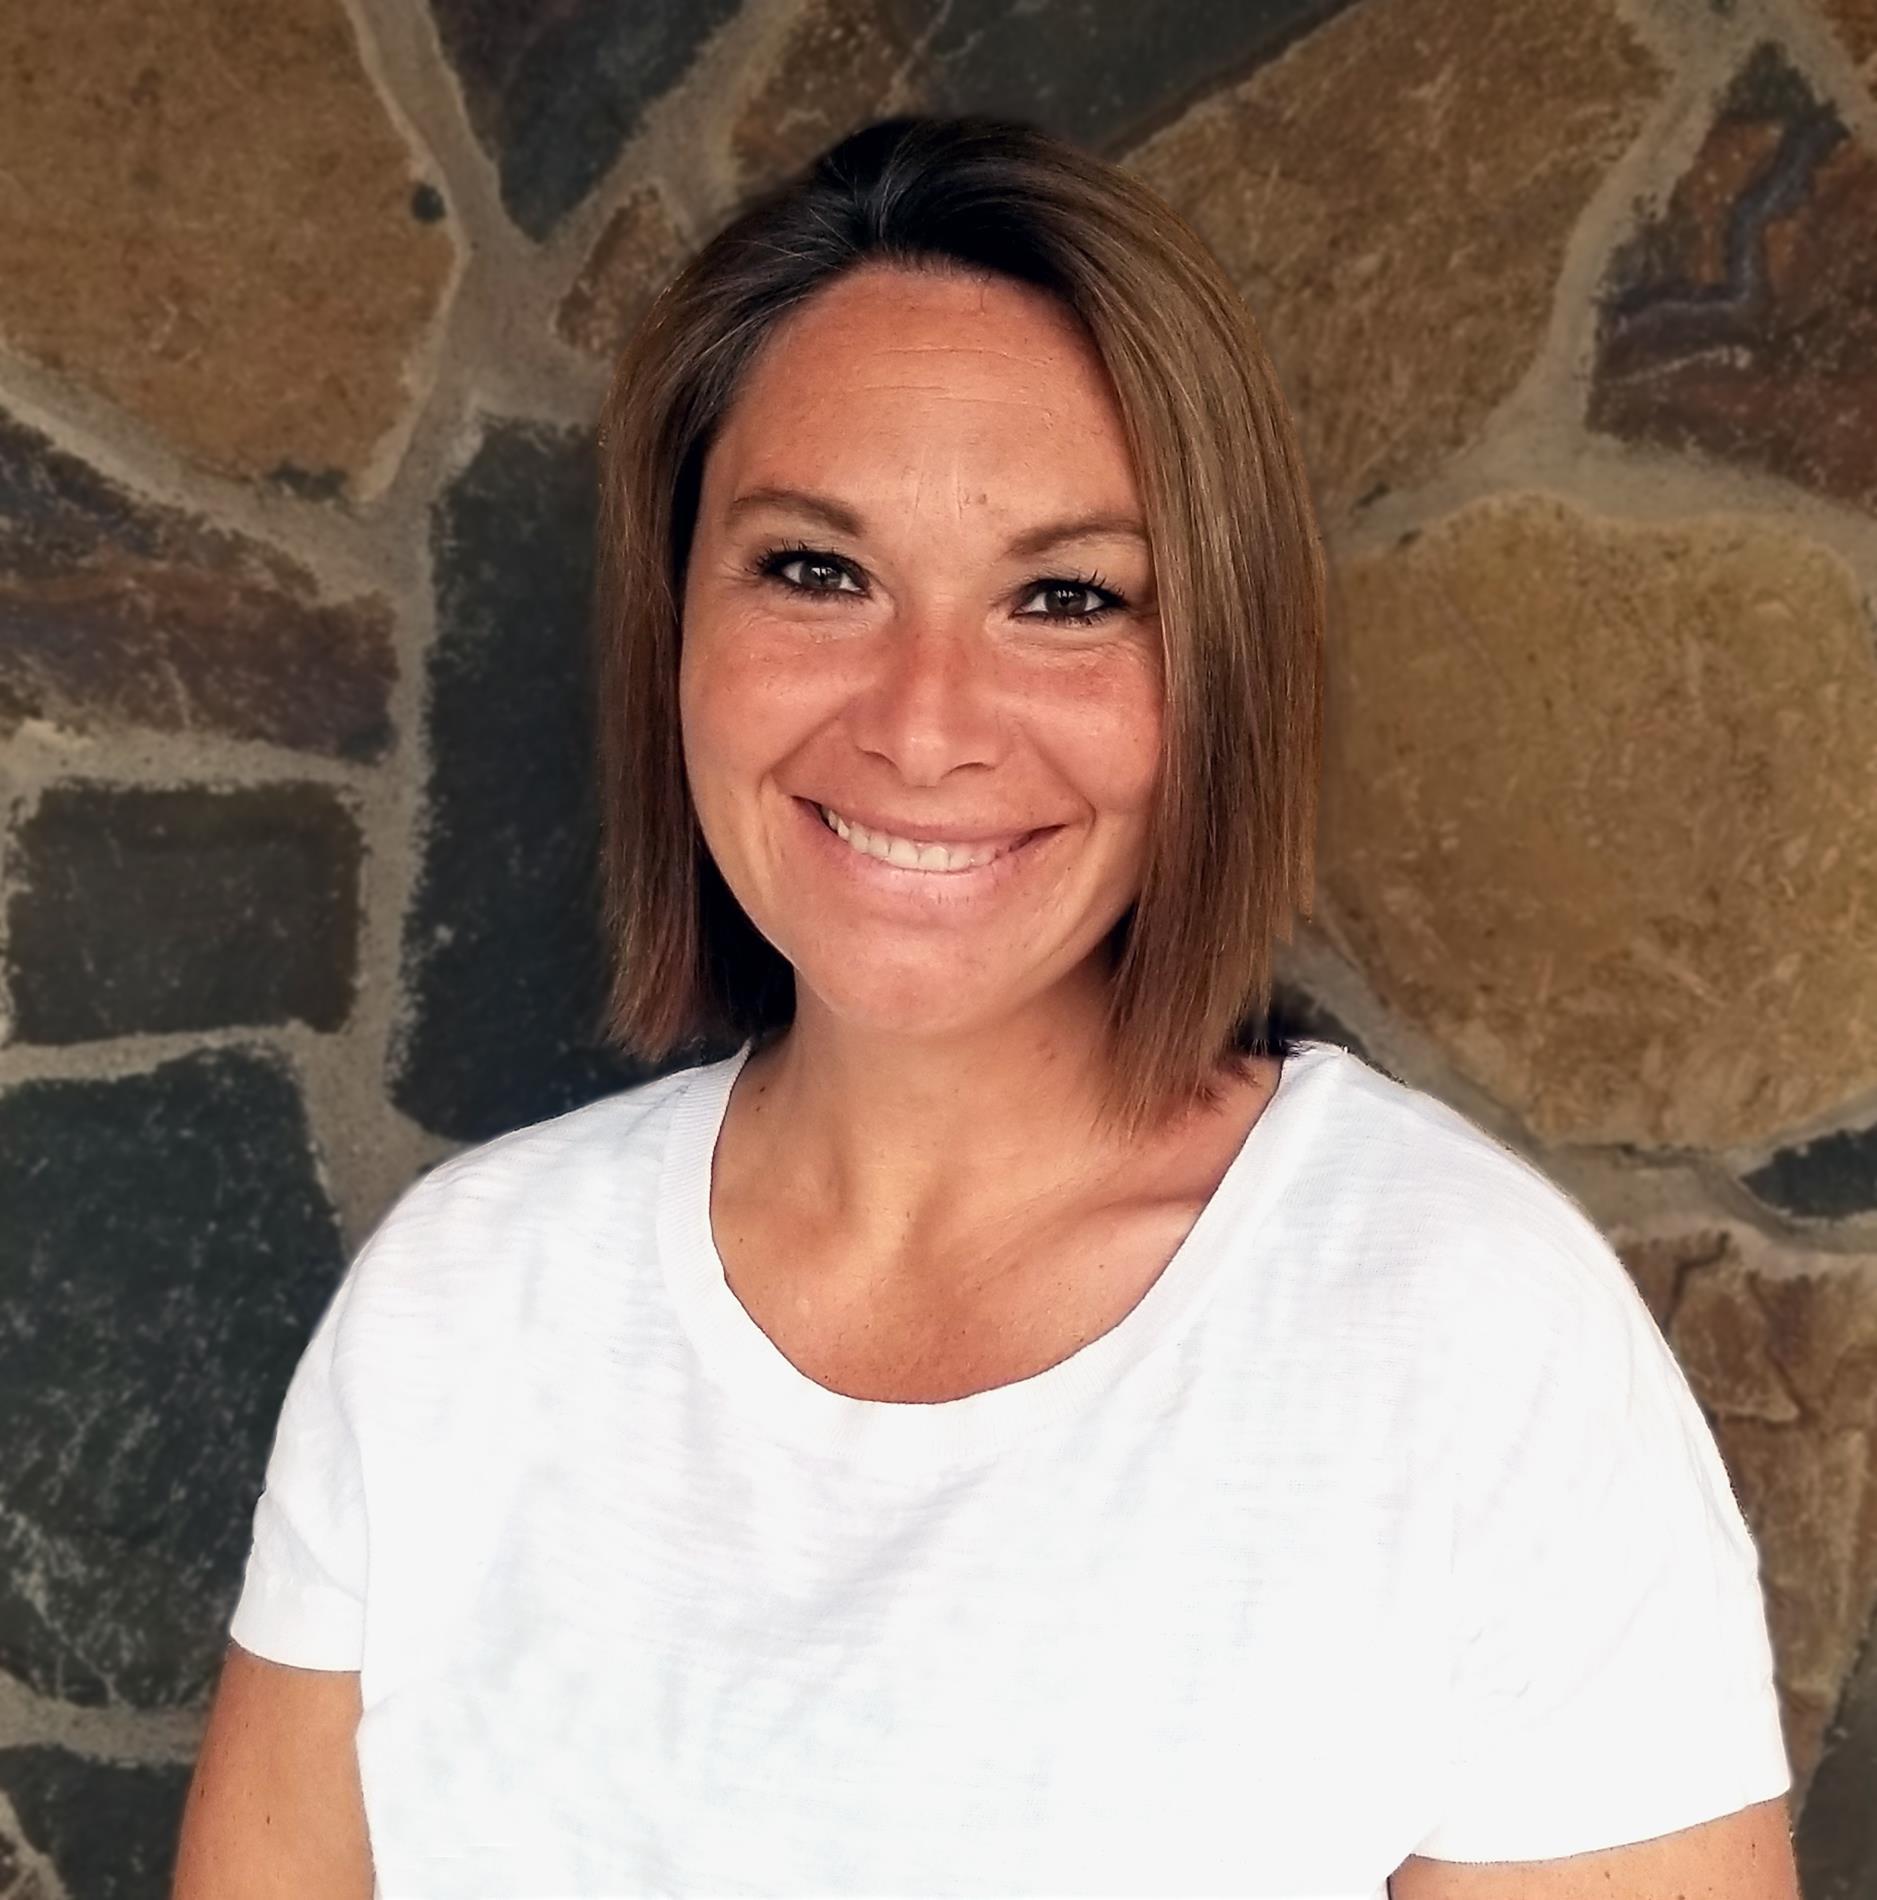 Image of ELD Coordinator Sarah Shields